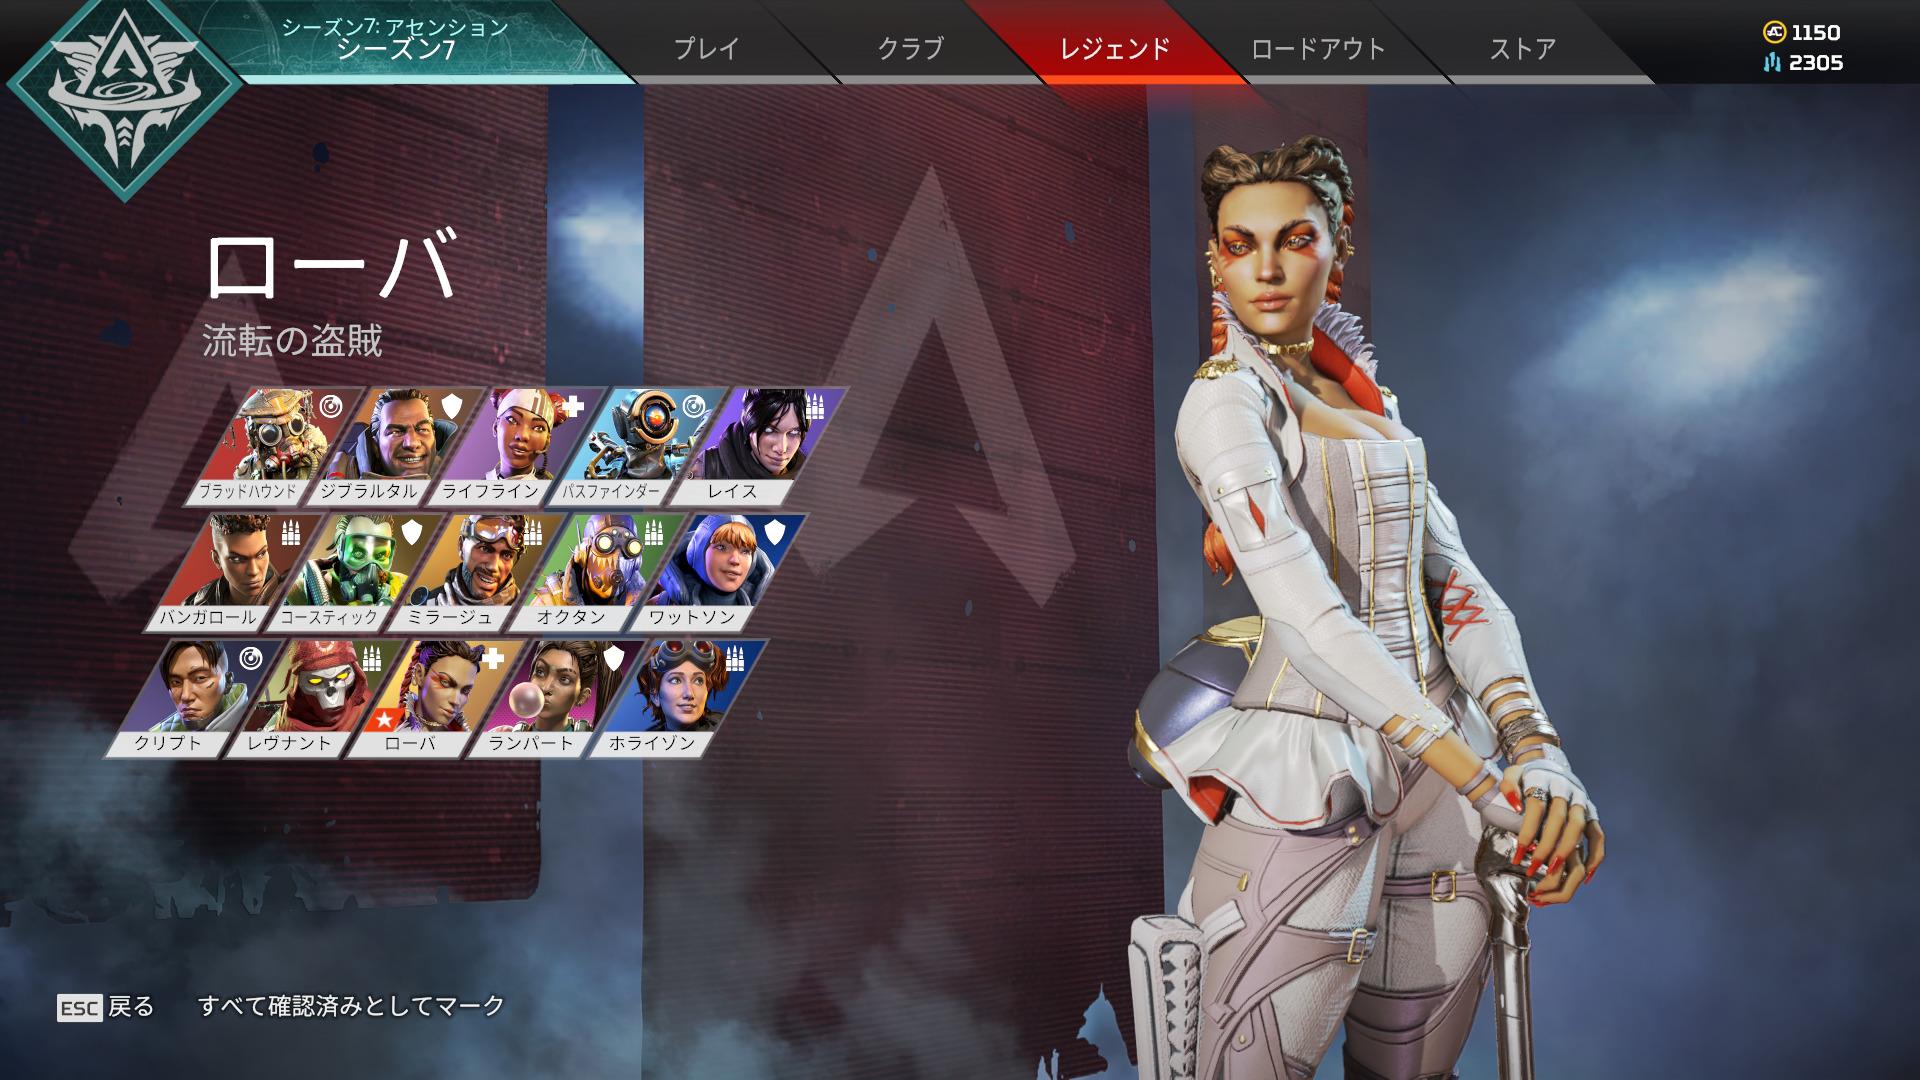 【Apex Legends】ローバ 日本語セリフ一覧【基本ボイス】【エーペックスレジェンズ】